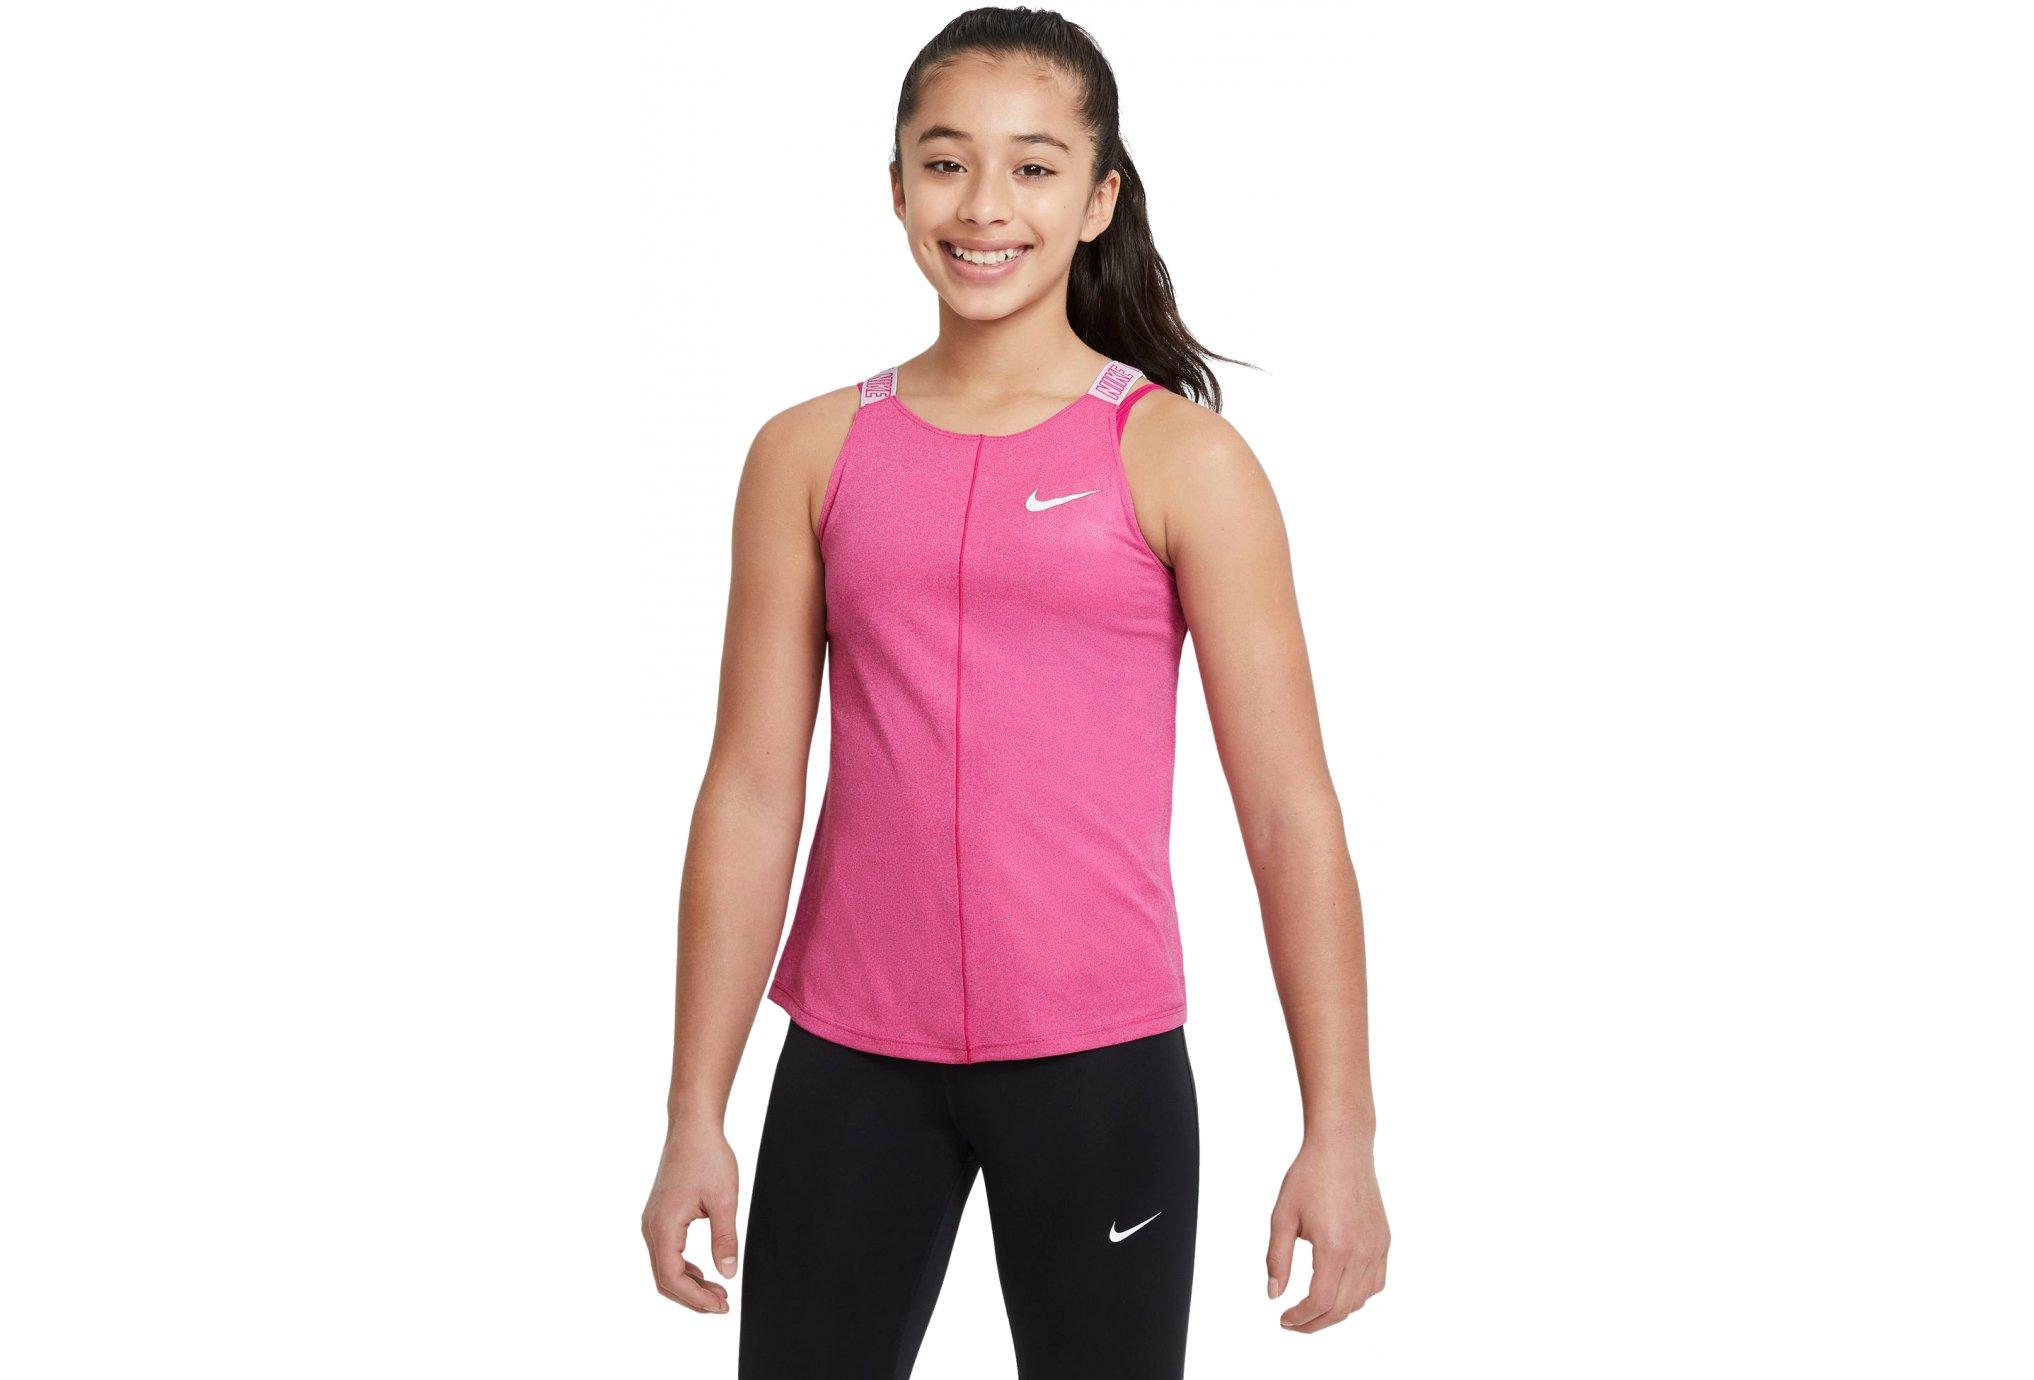 Nike Dri-Fit Fille vêtement running femme